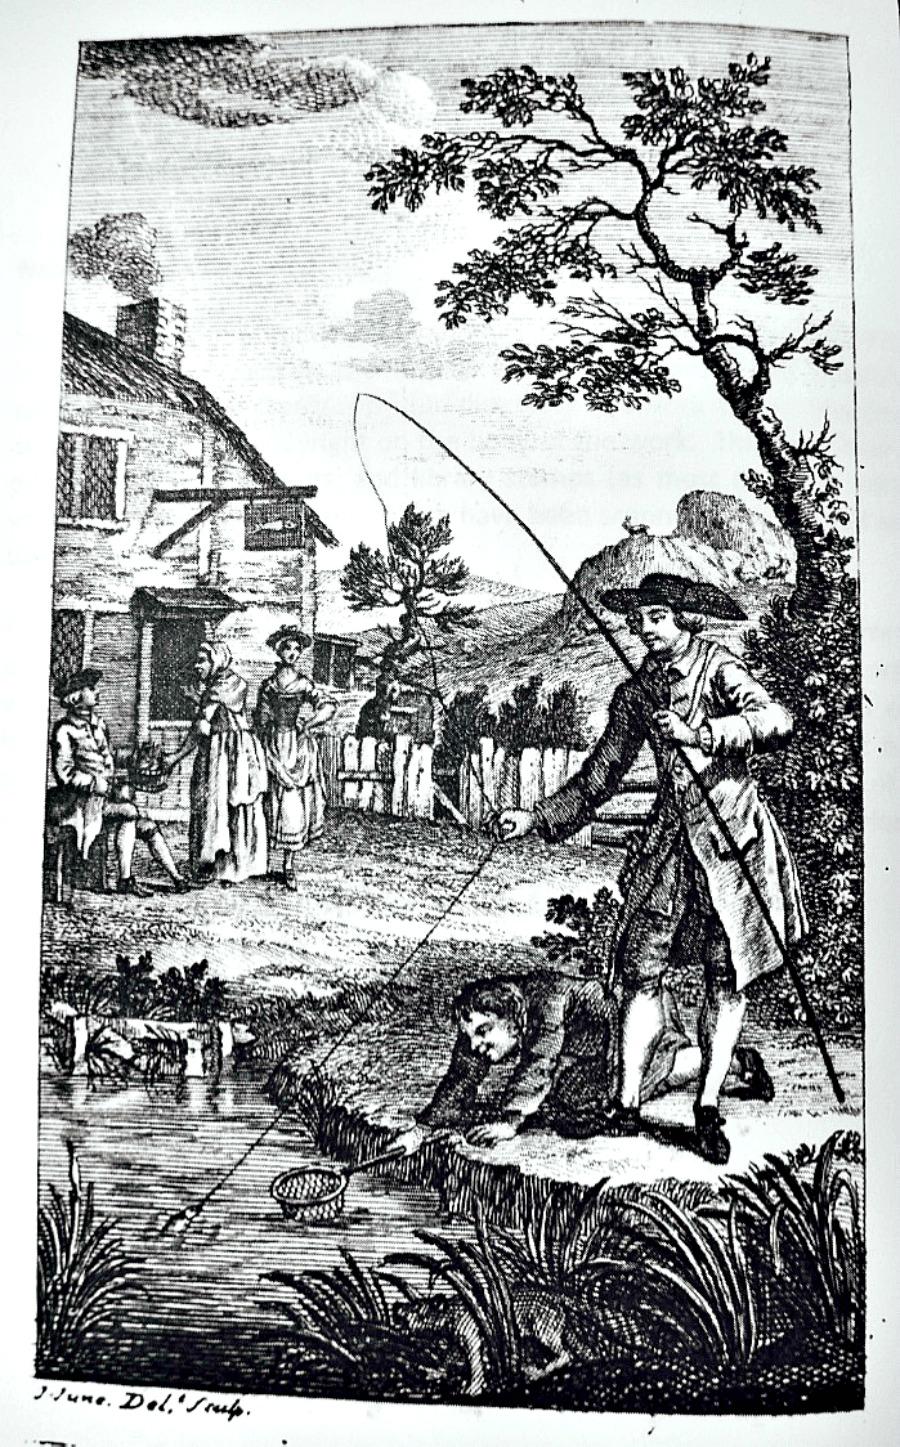 fly fishing tactics- how long thy rod